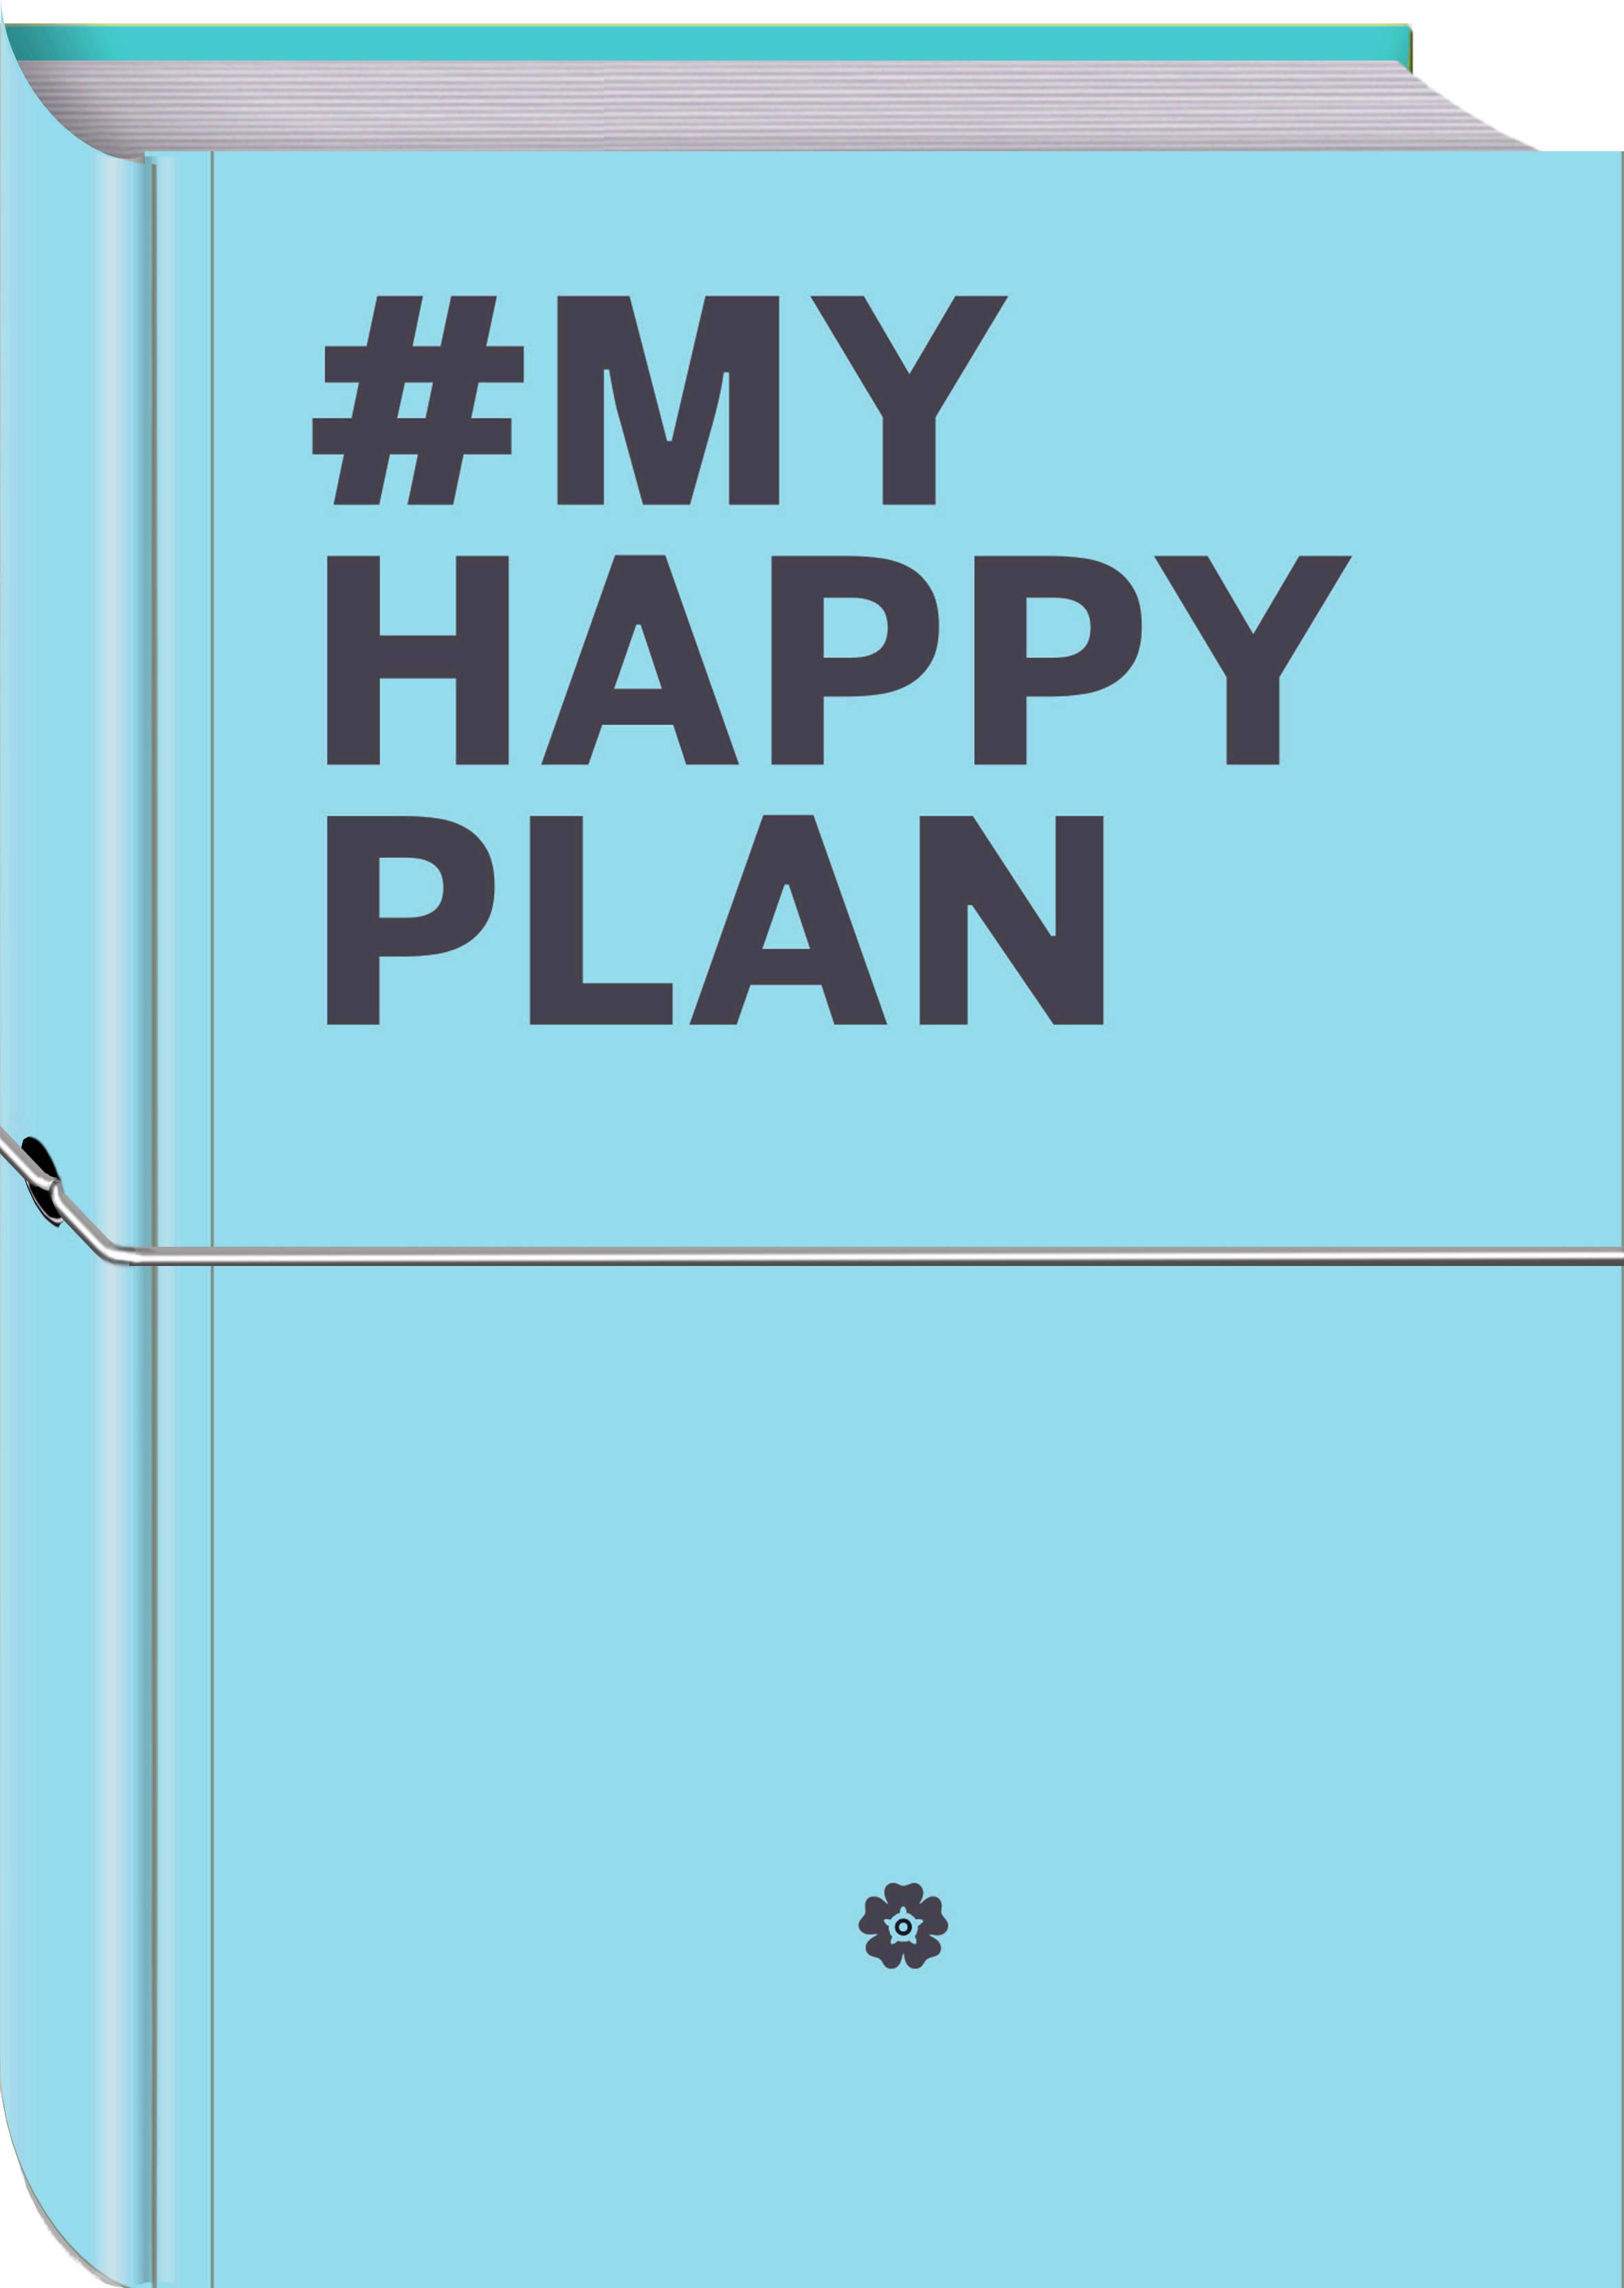 My Happy Plan (Морской) (большой формат 165 х 240, лента ляссе, серебряная резинка)